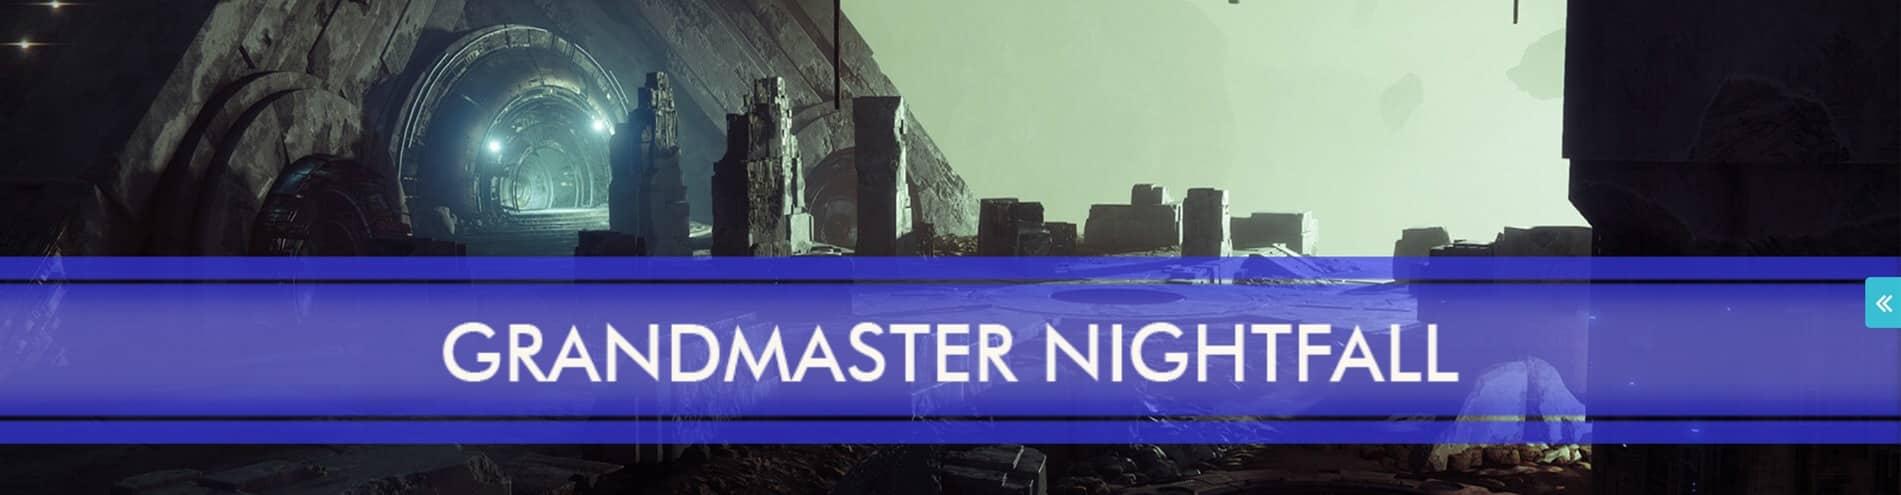 Destiny 2 raiding Grandmaster Nightfall Carries